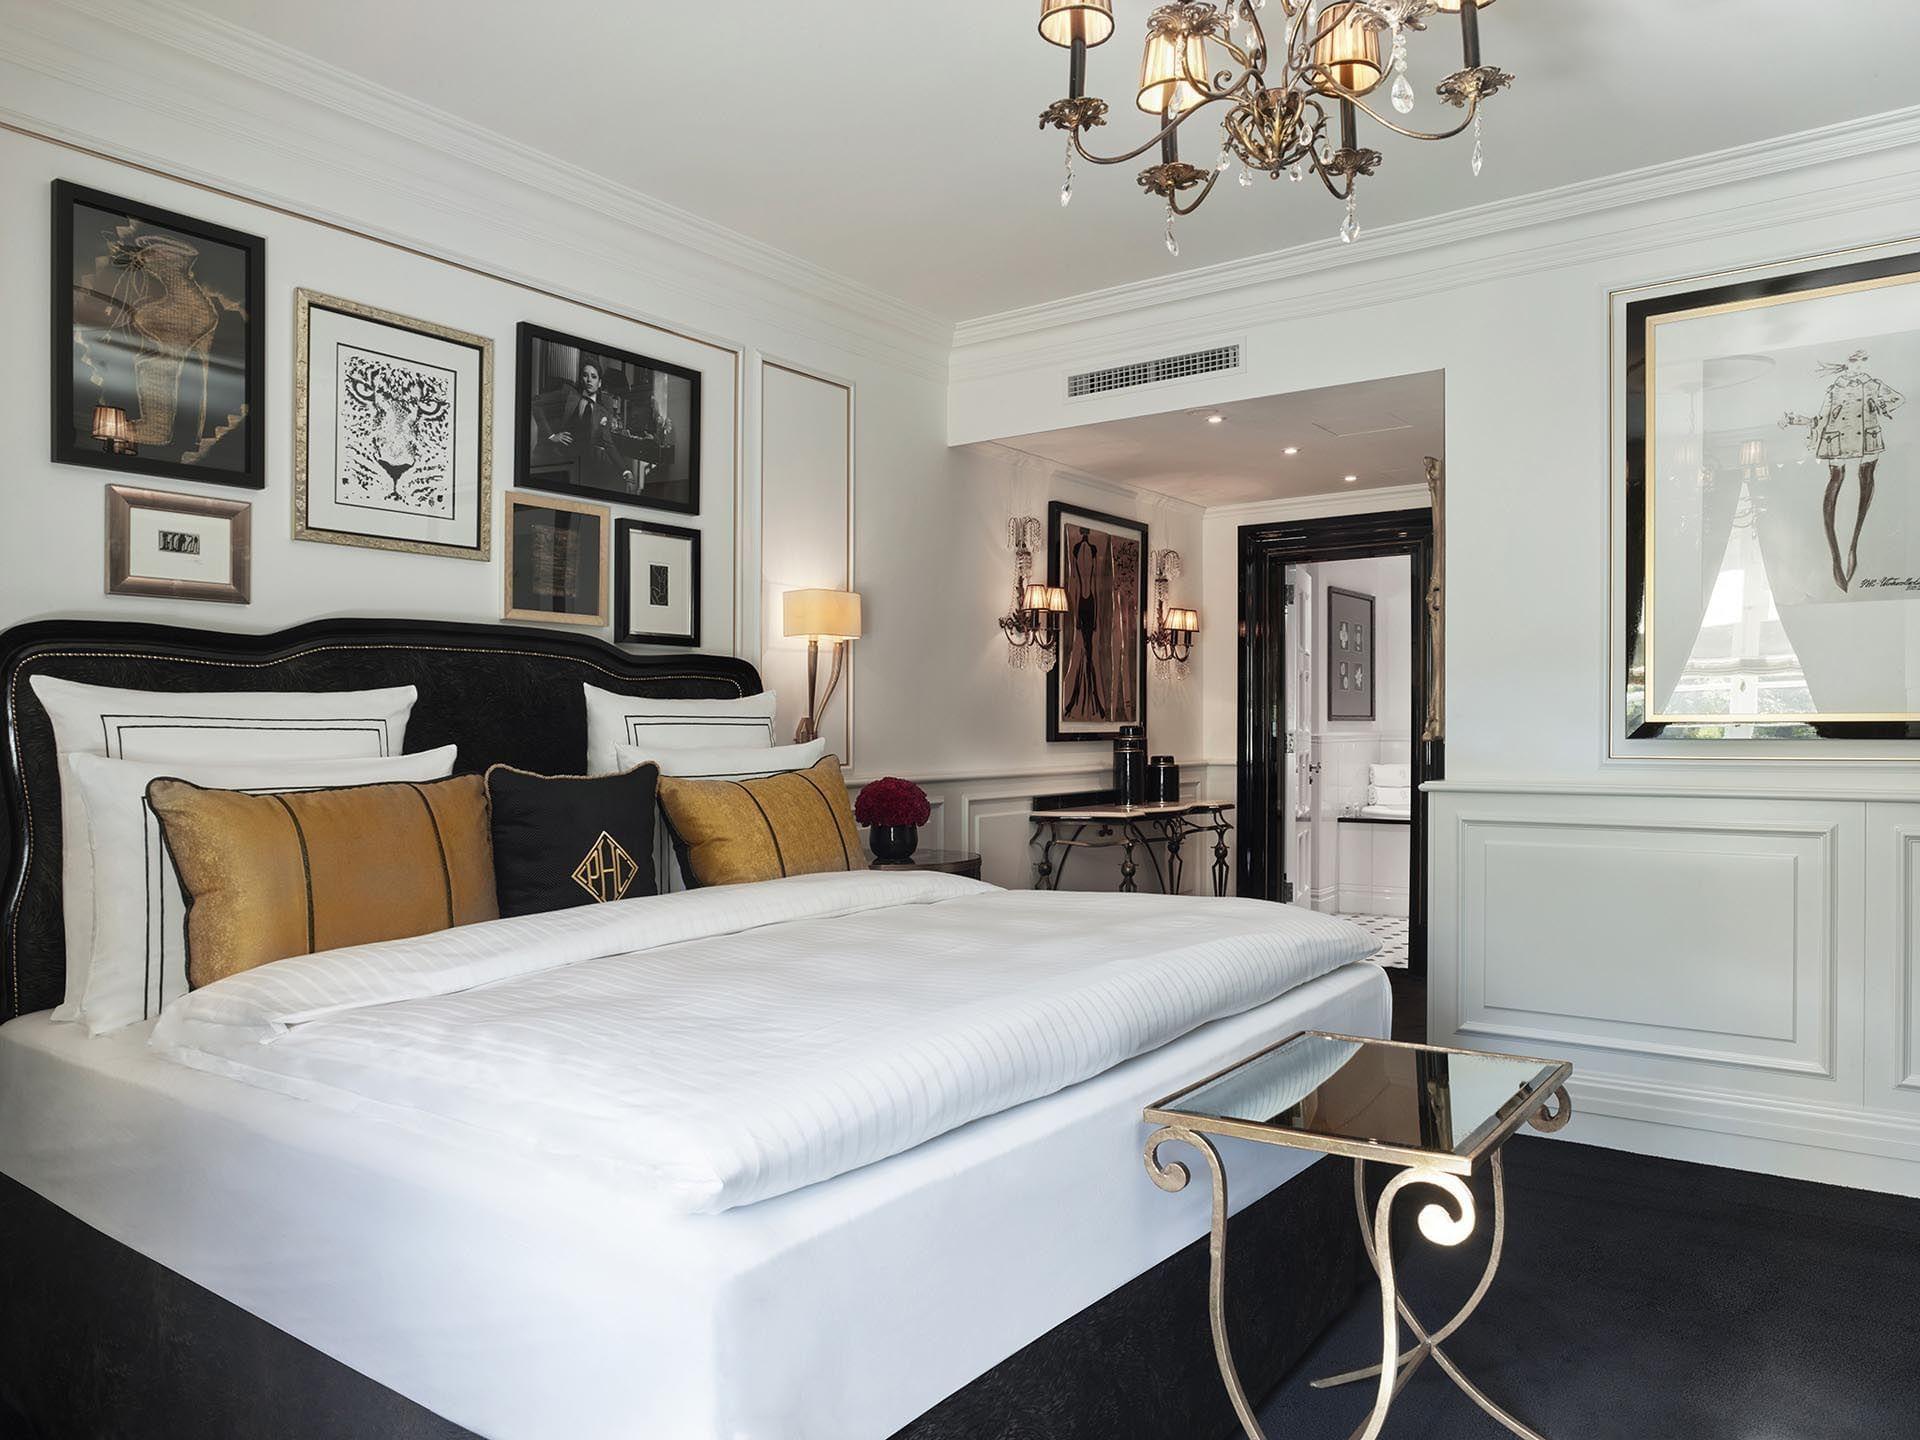 King Premium Room at Patrick Hellman Schlosshotel